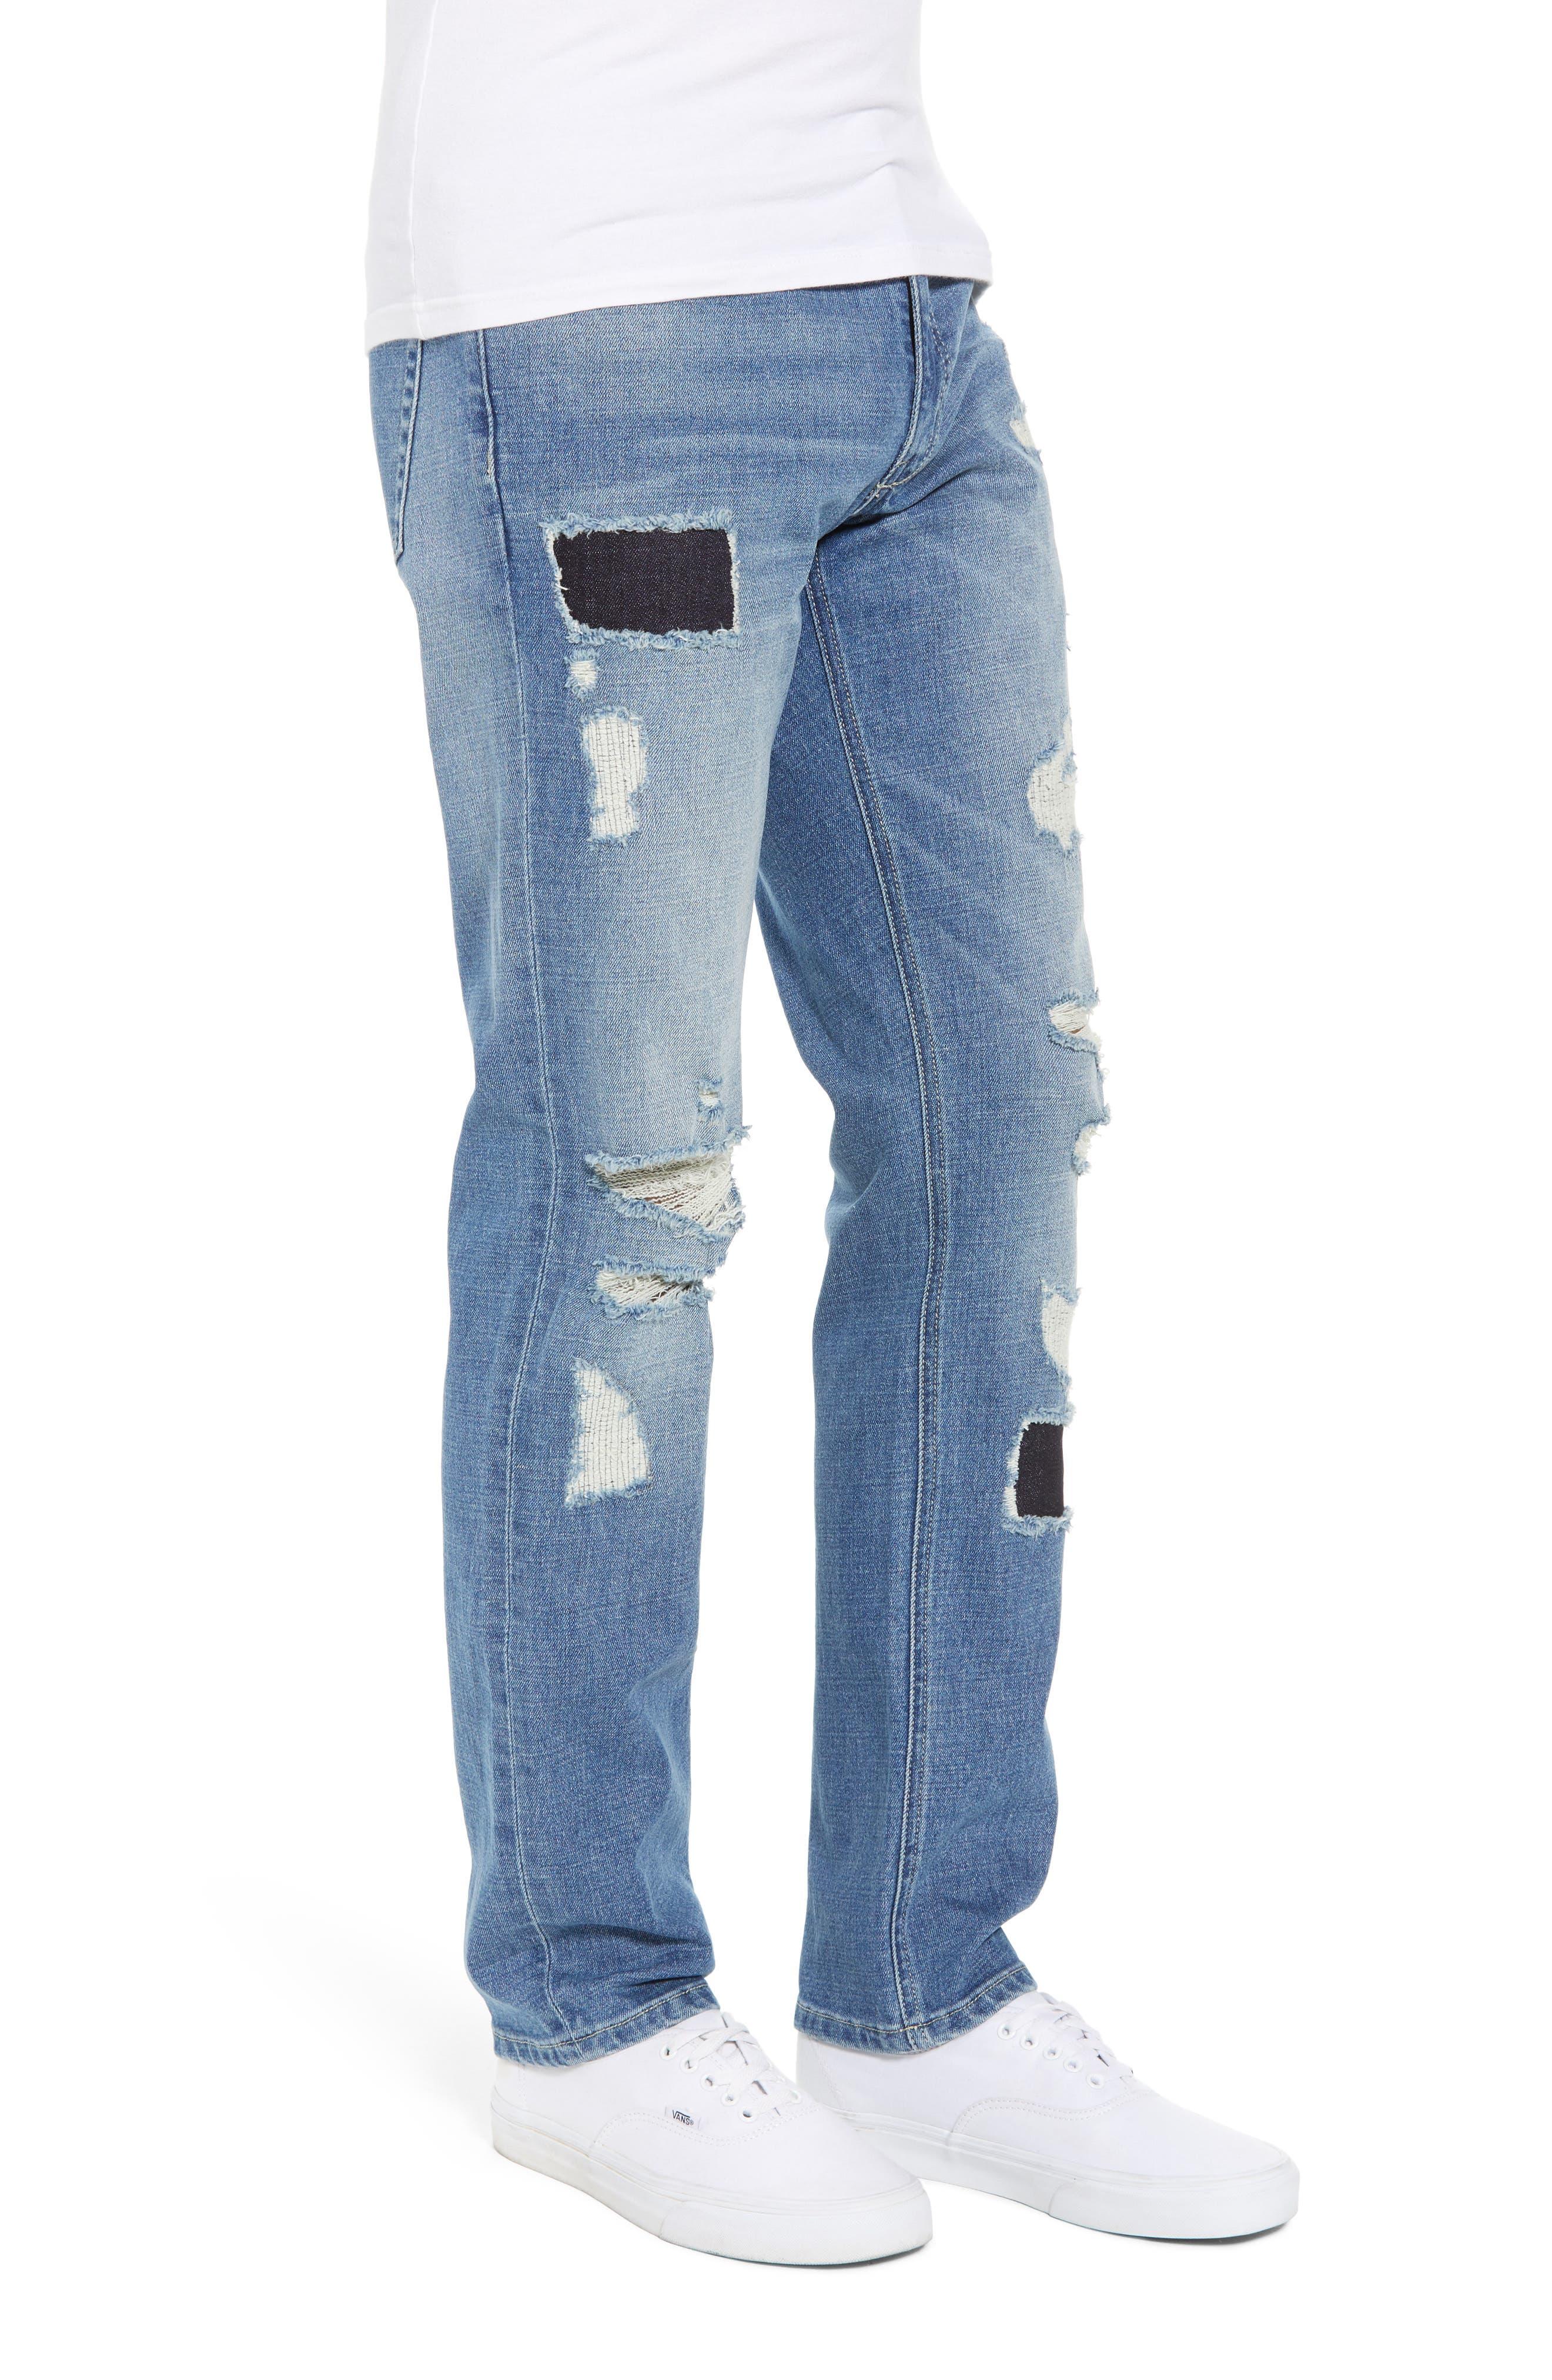 Rip & Repair Stretch Slim Jeans,                             Alternate thumbnail 3, color,                             BLUE HETFIELD WASH